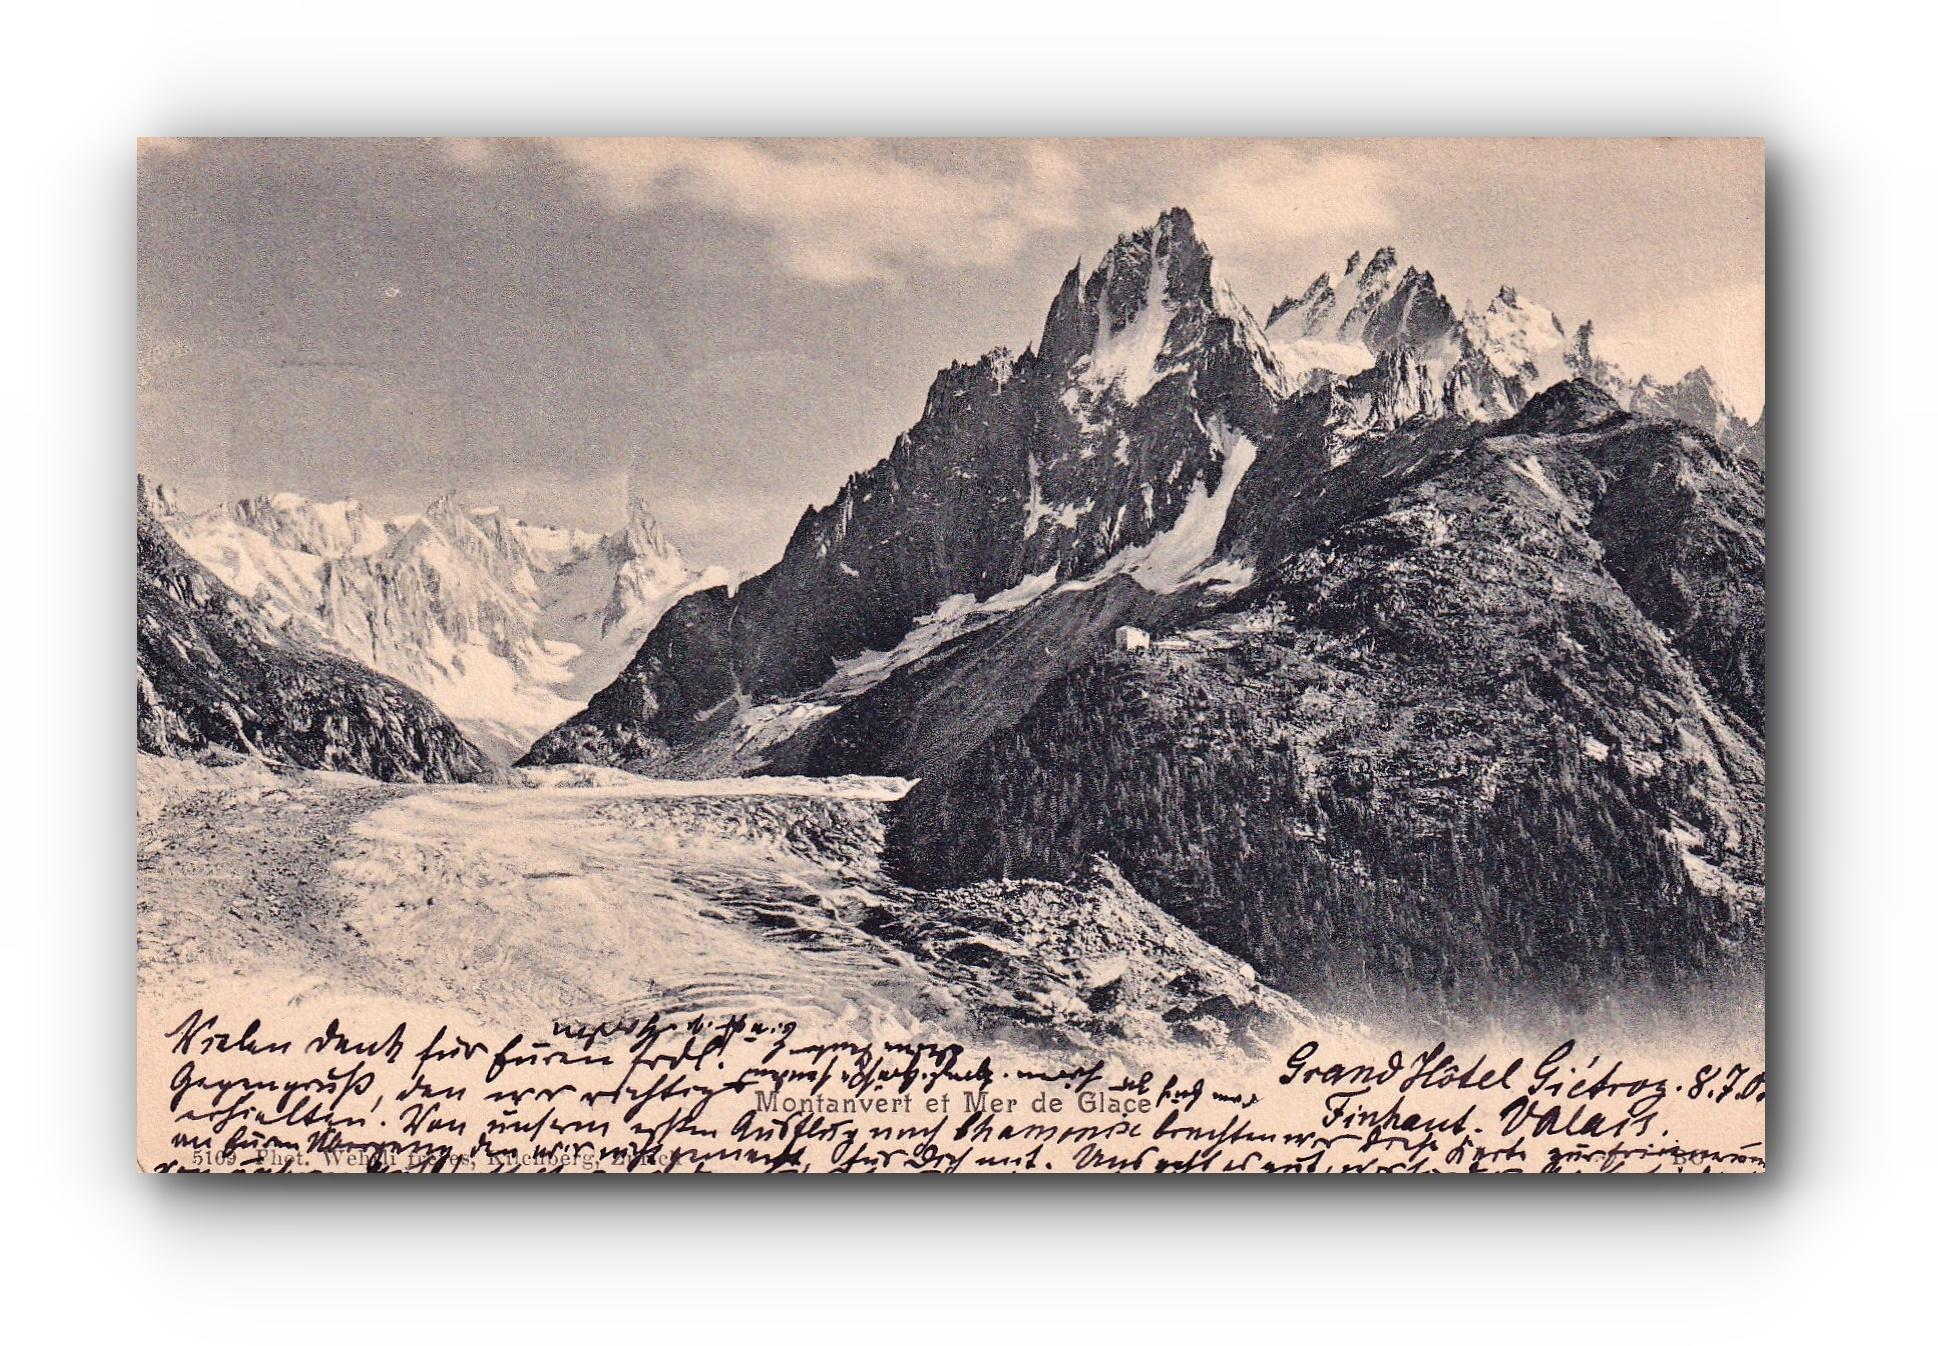 Montanvert et mer de glace - 08.07.1905